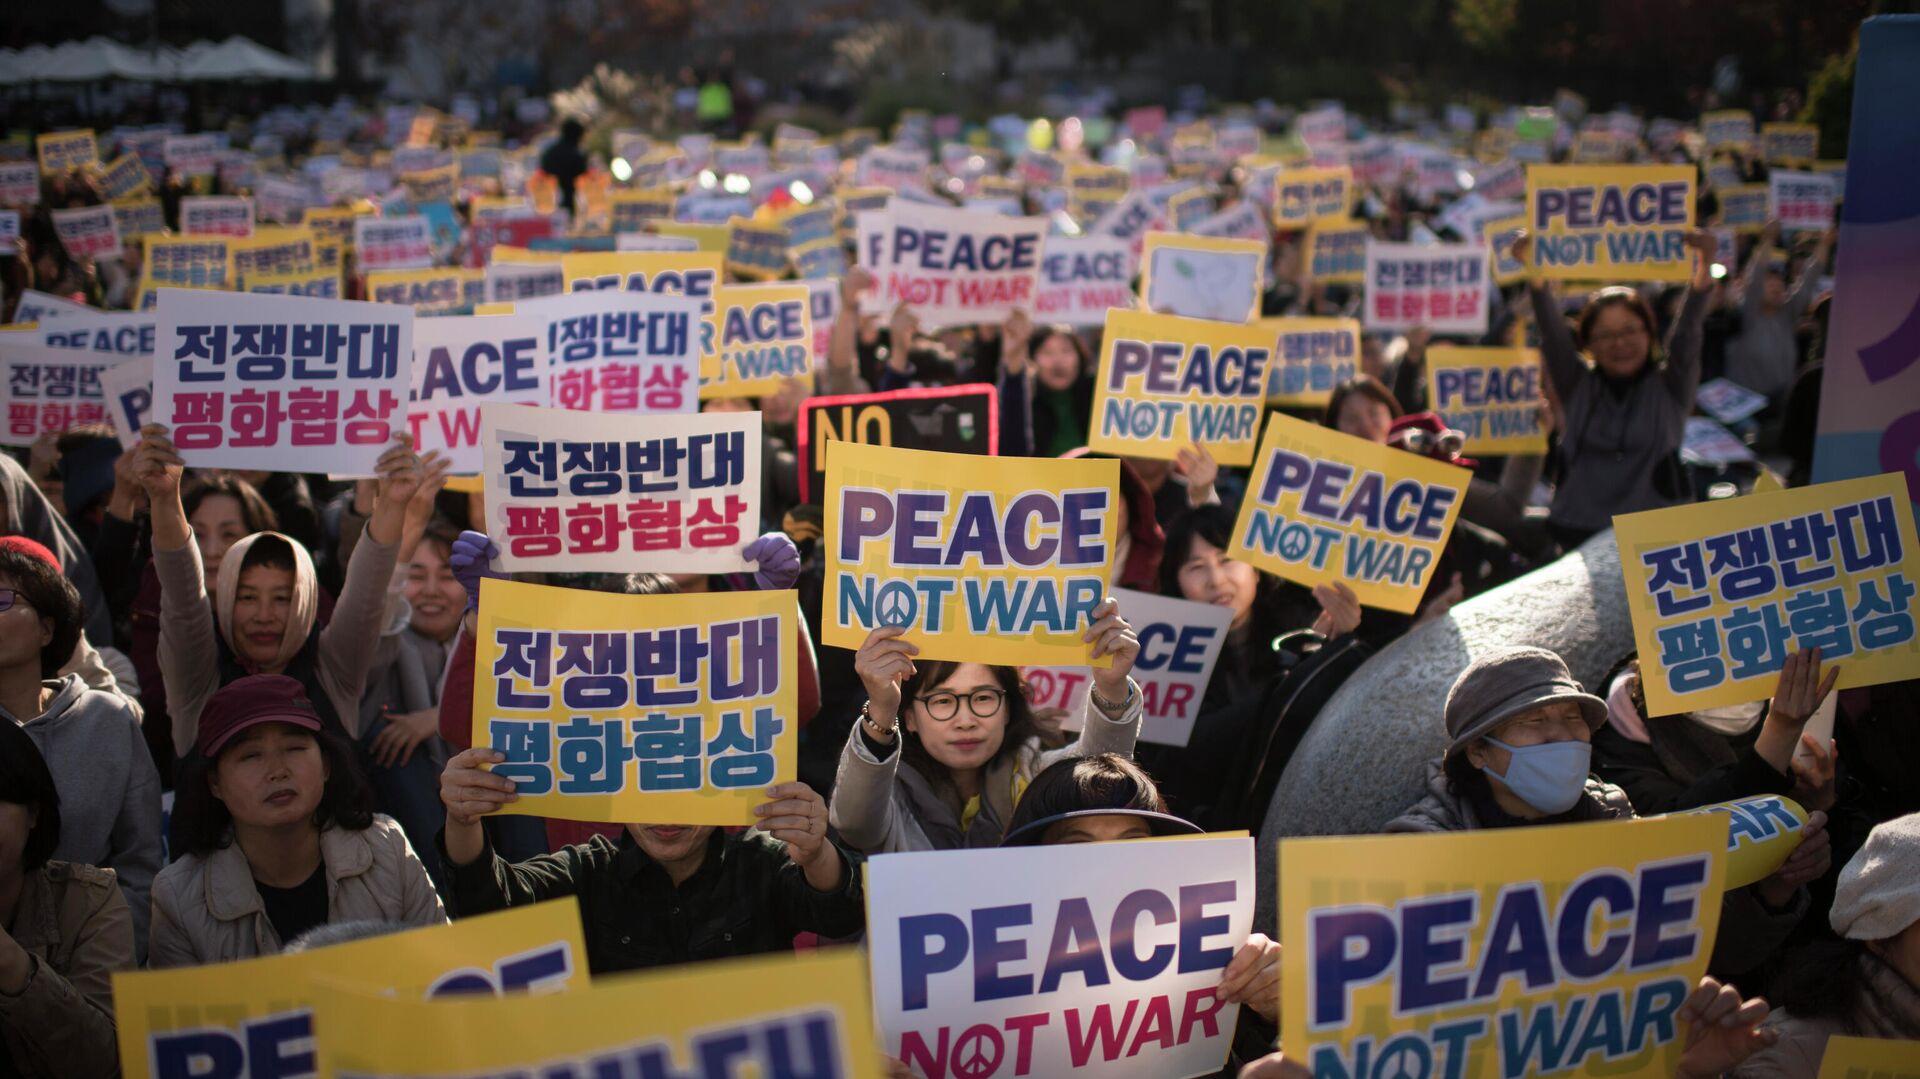 Demonstranten in Seoul fordern Regelung des Konflikts mit Nordkorea (Archivbild) - SNA, 1920, 17.12.2020